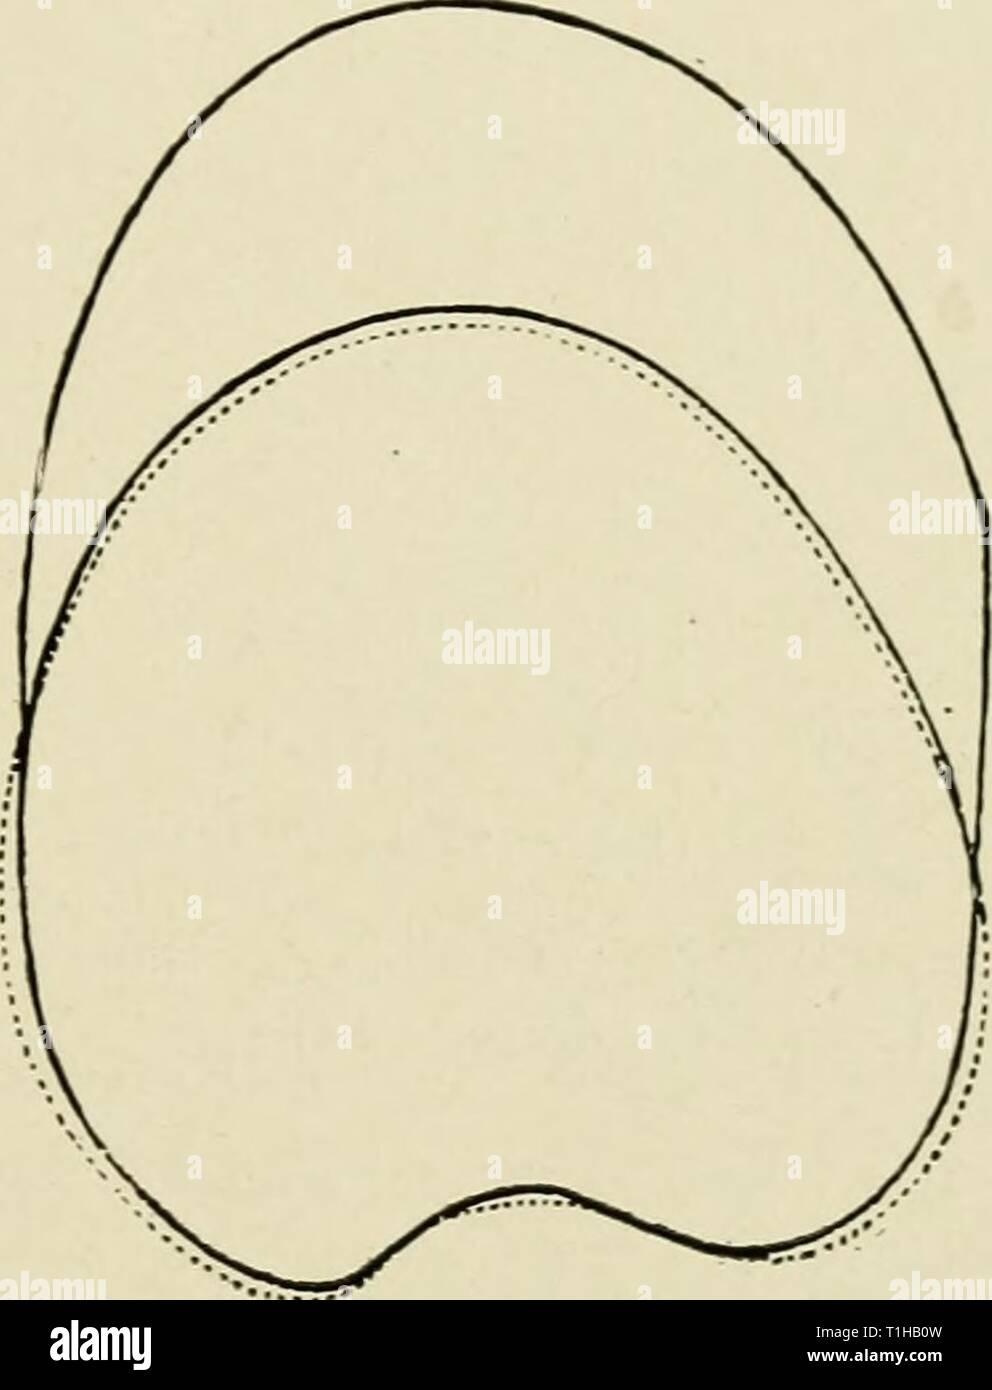 hight resolution of apex occipital diagram best wiring diagram apex occipital diagram